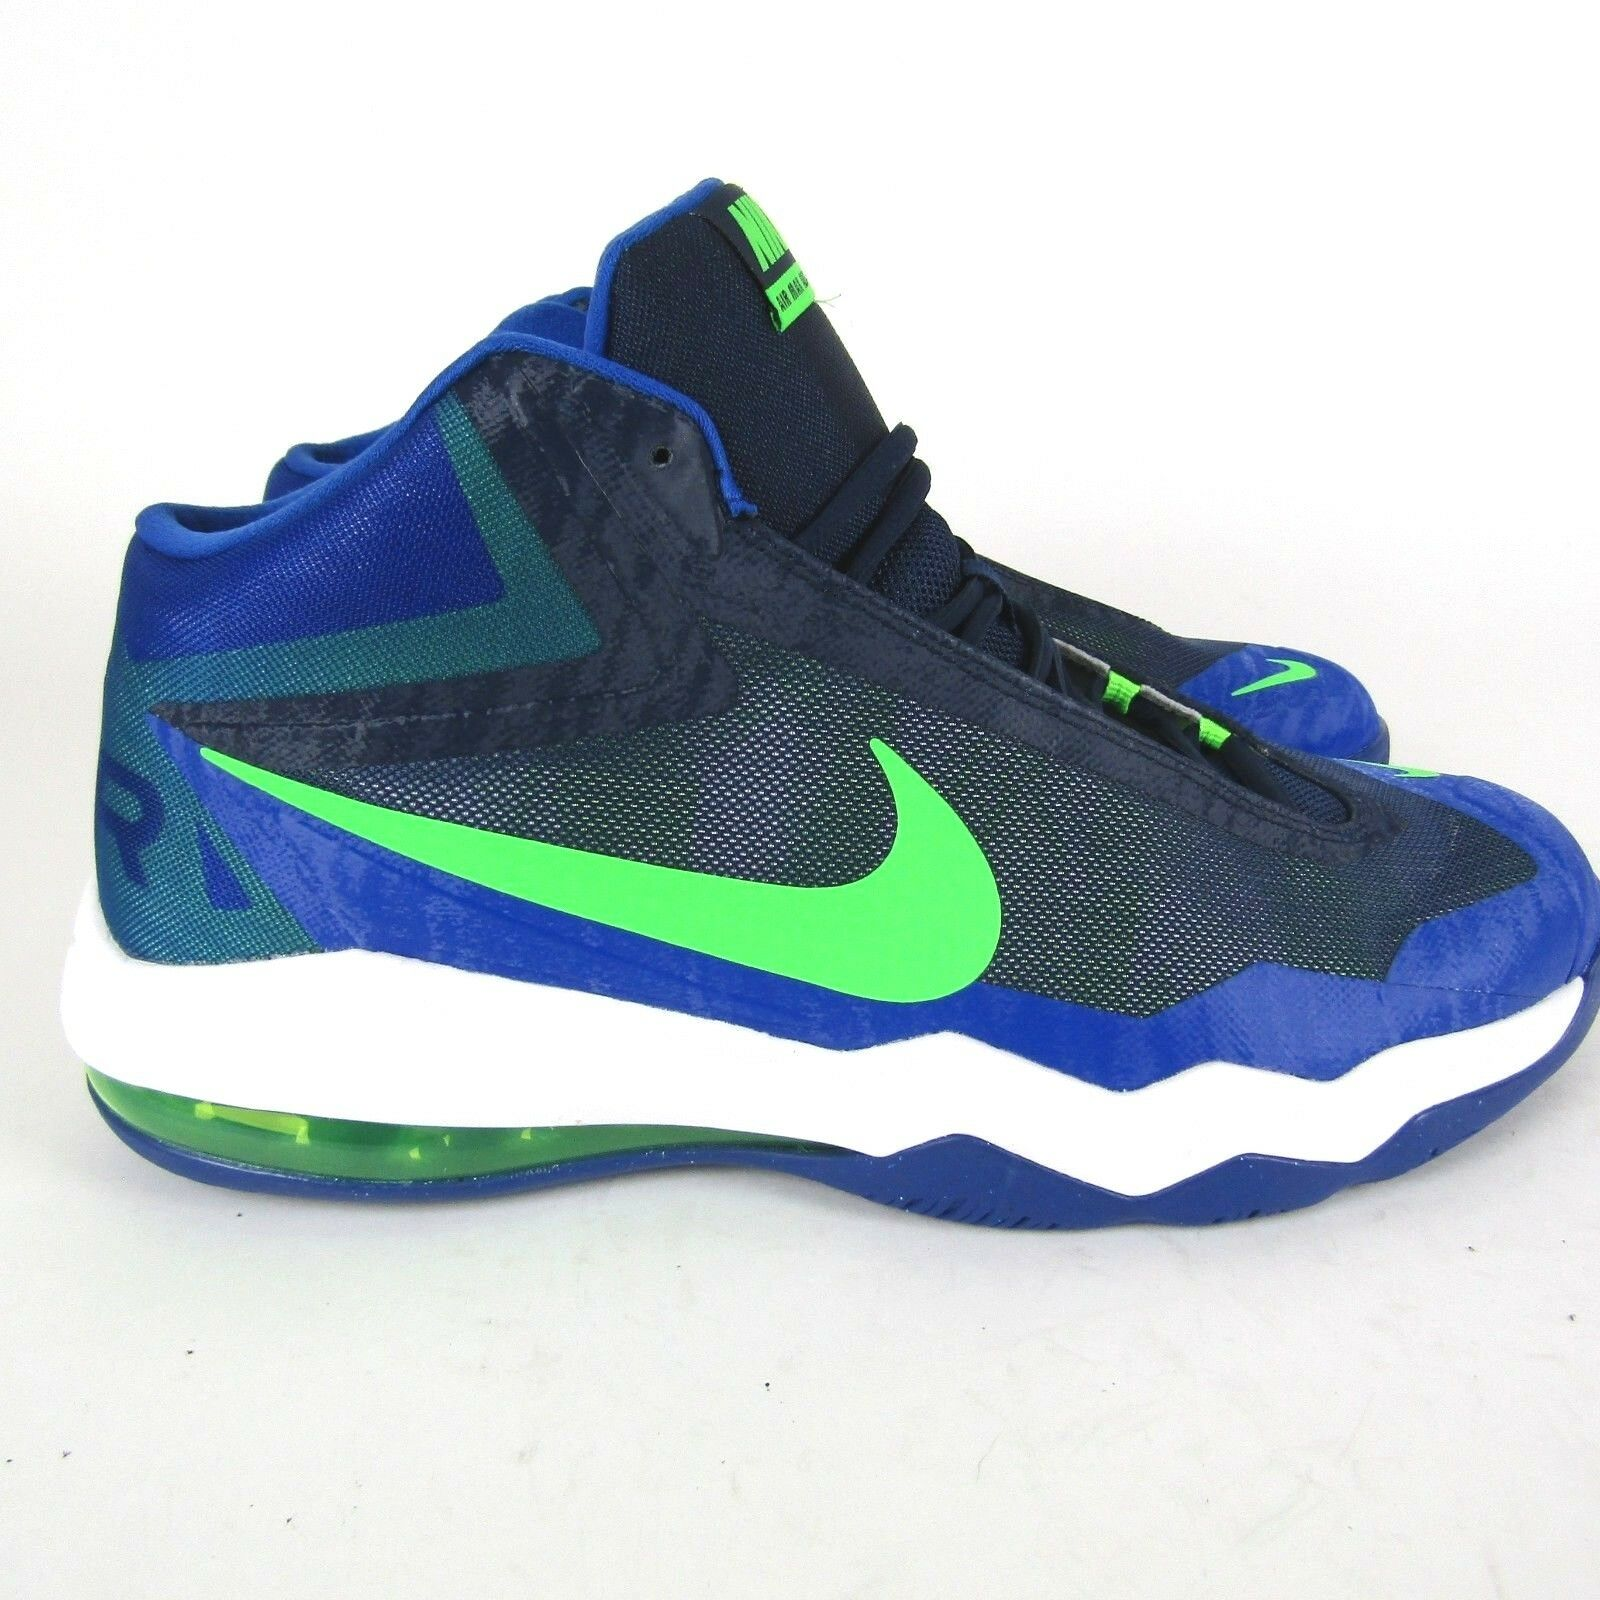 0300073b12 NEW Nike Air Max Audacity 704920-401 Basketball Mid Navy Green Streak White  13